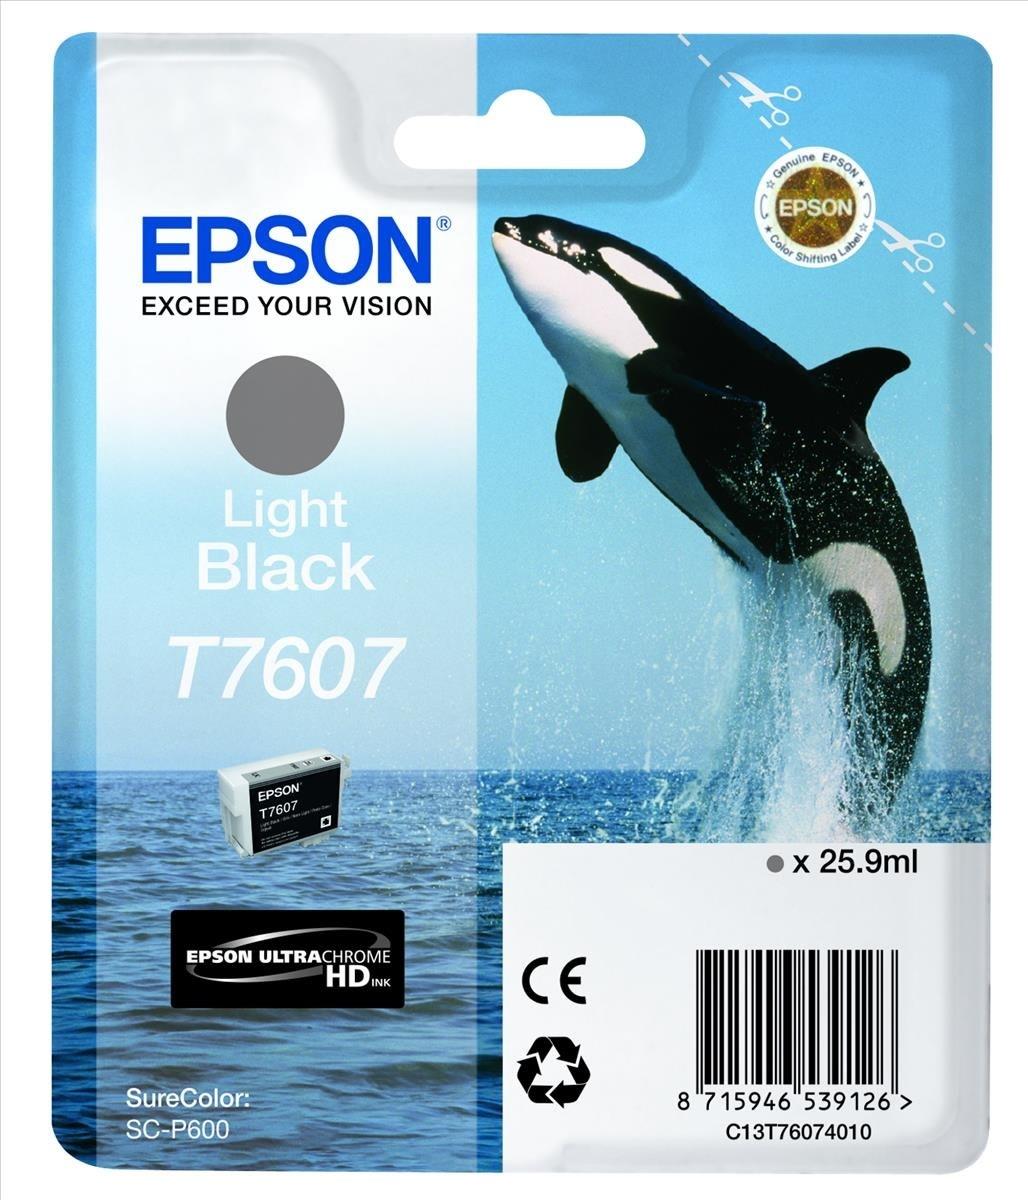 Epson T7607 blækpatron, Lys Sort, 25.9 ml.